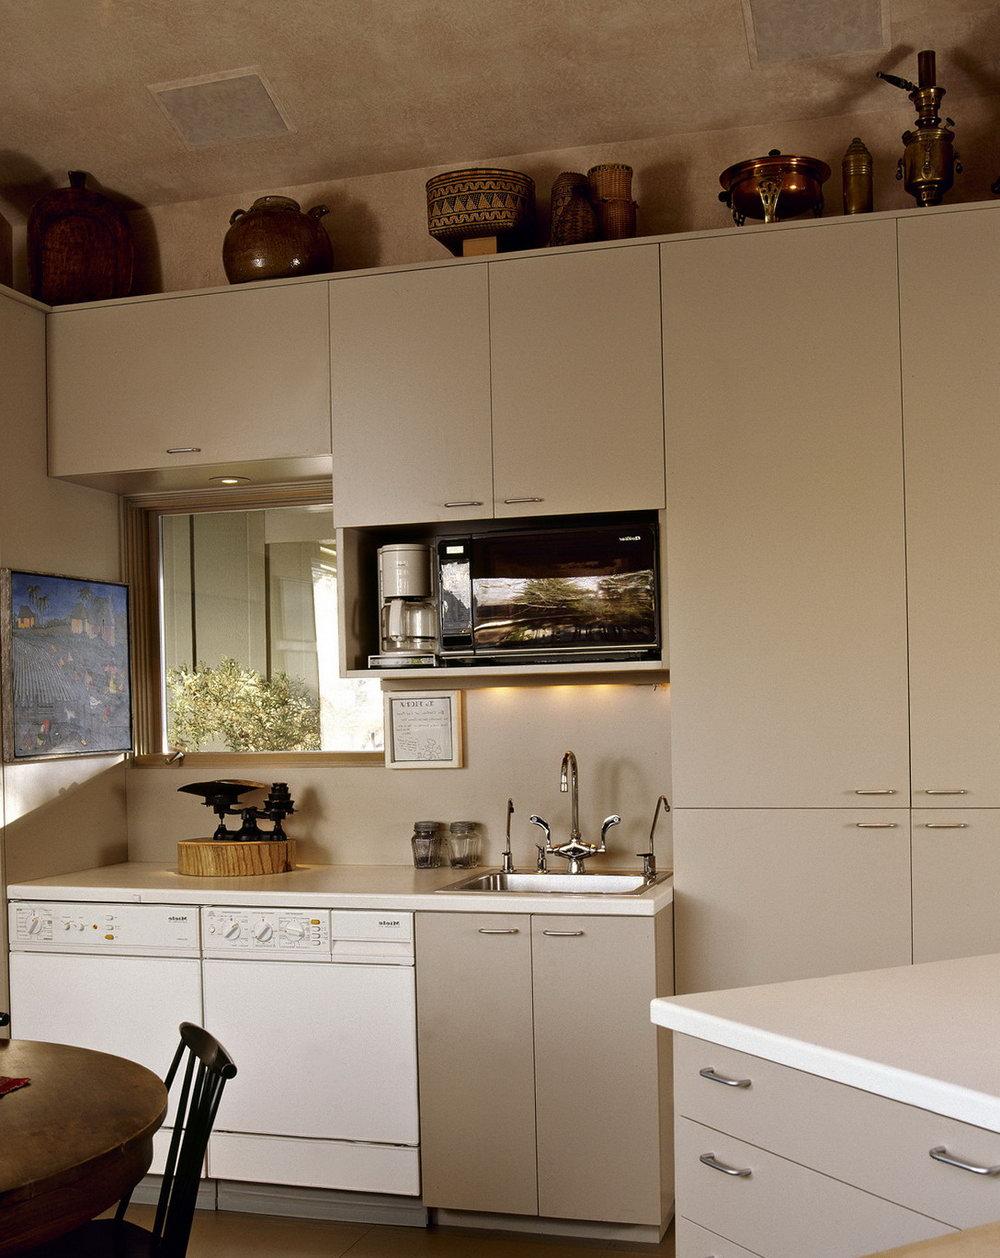 Beige Kitchen Cabinets Images